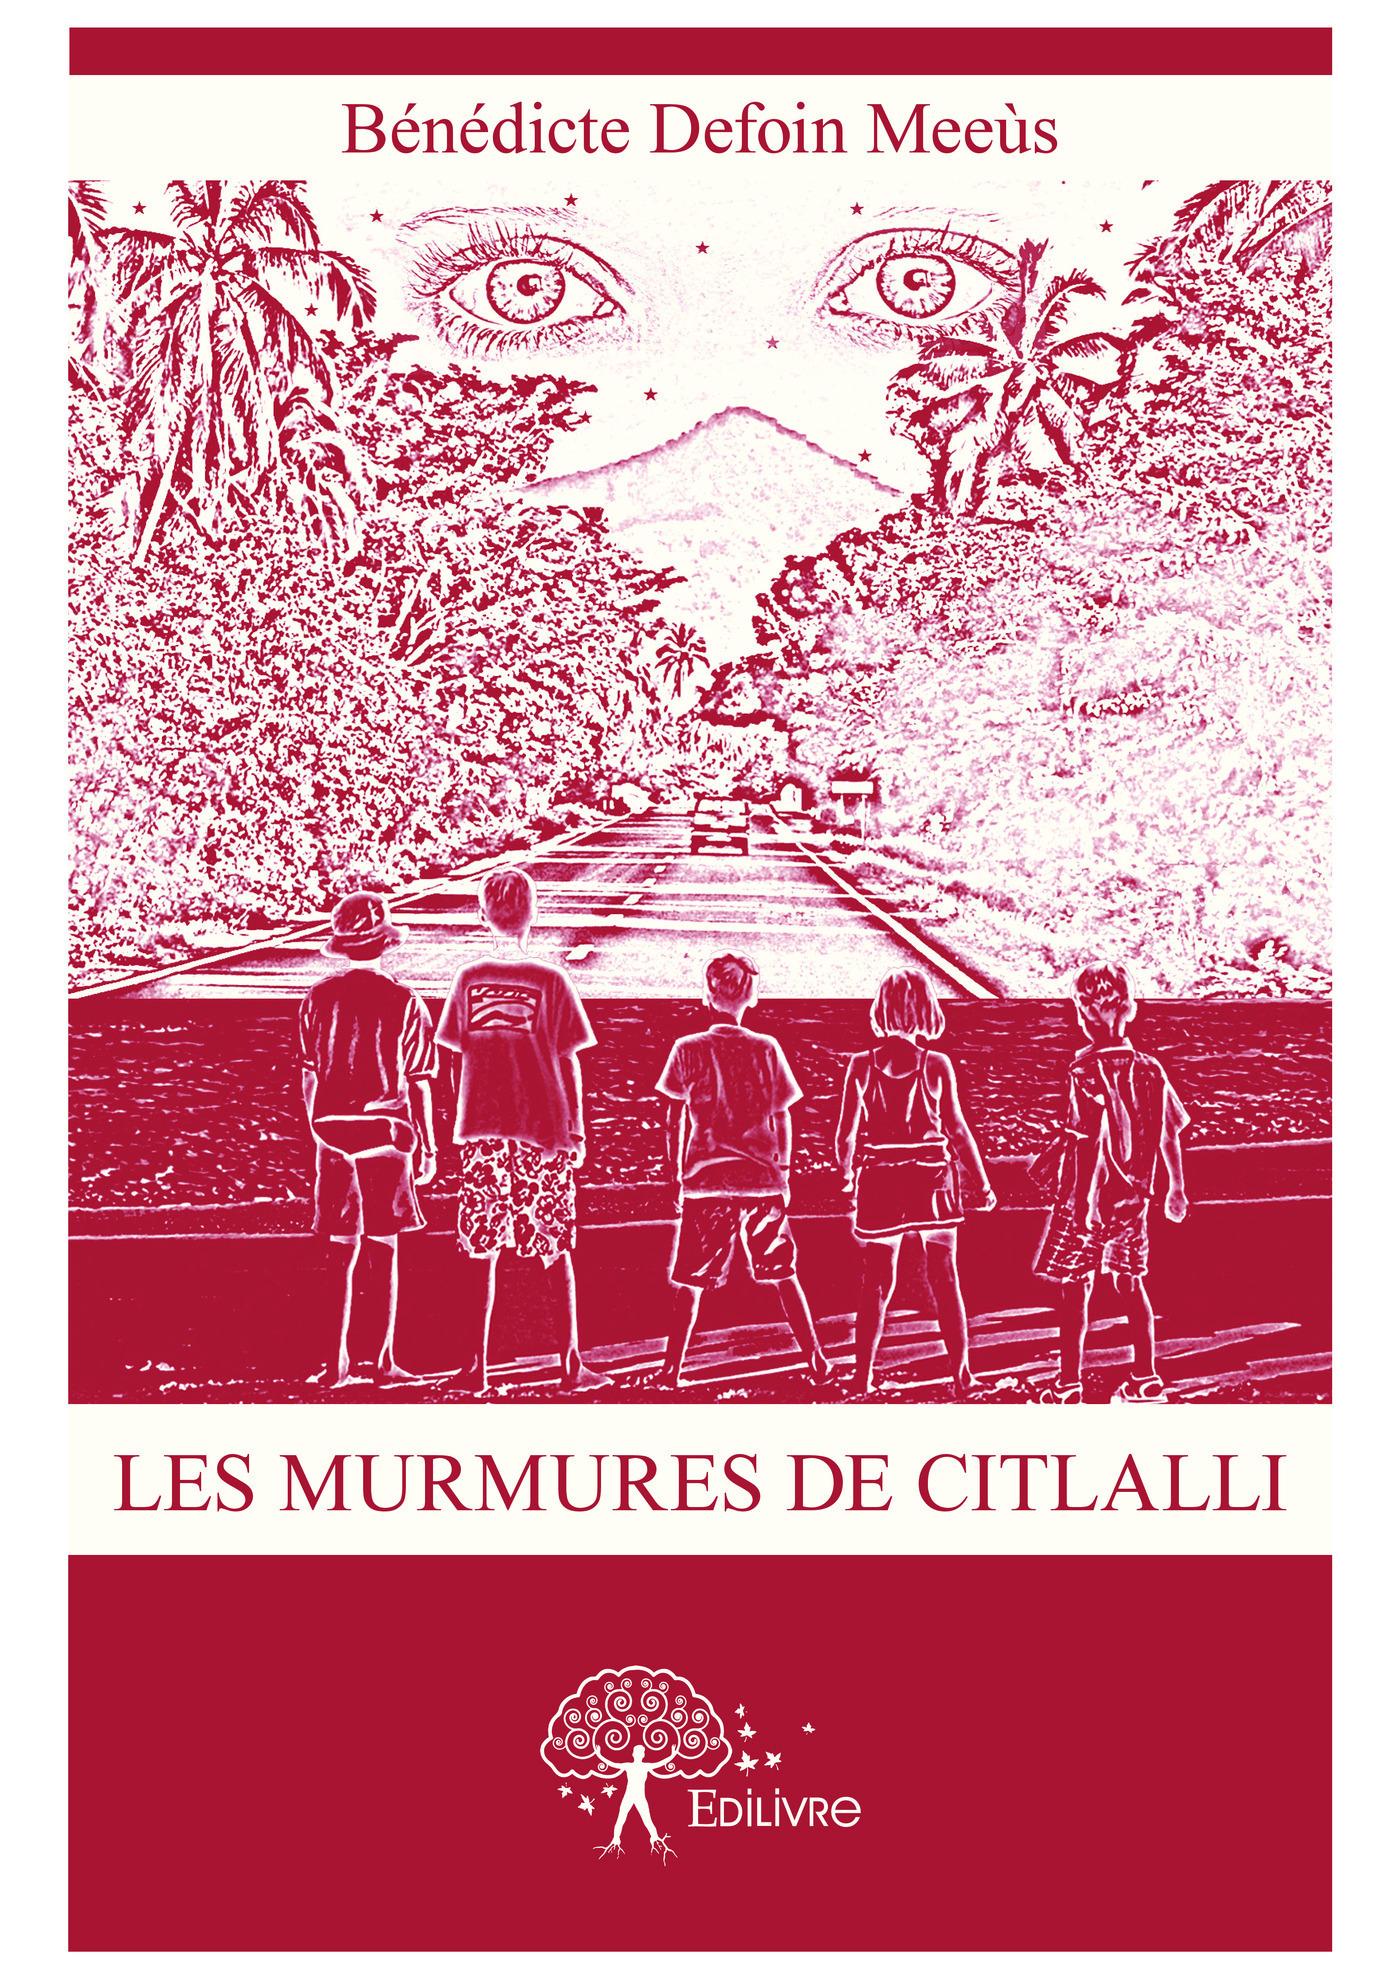 Les murmures de Citlalli  - Bénédicte Defoin Meeùs